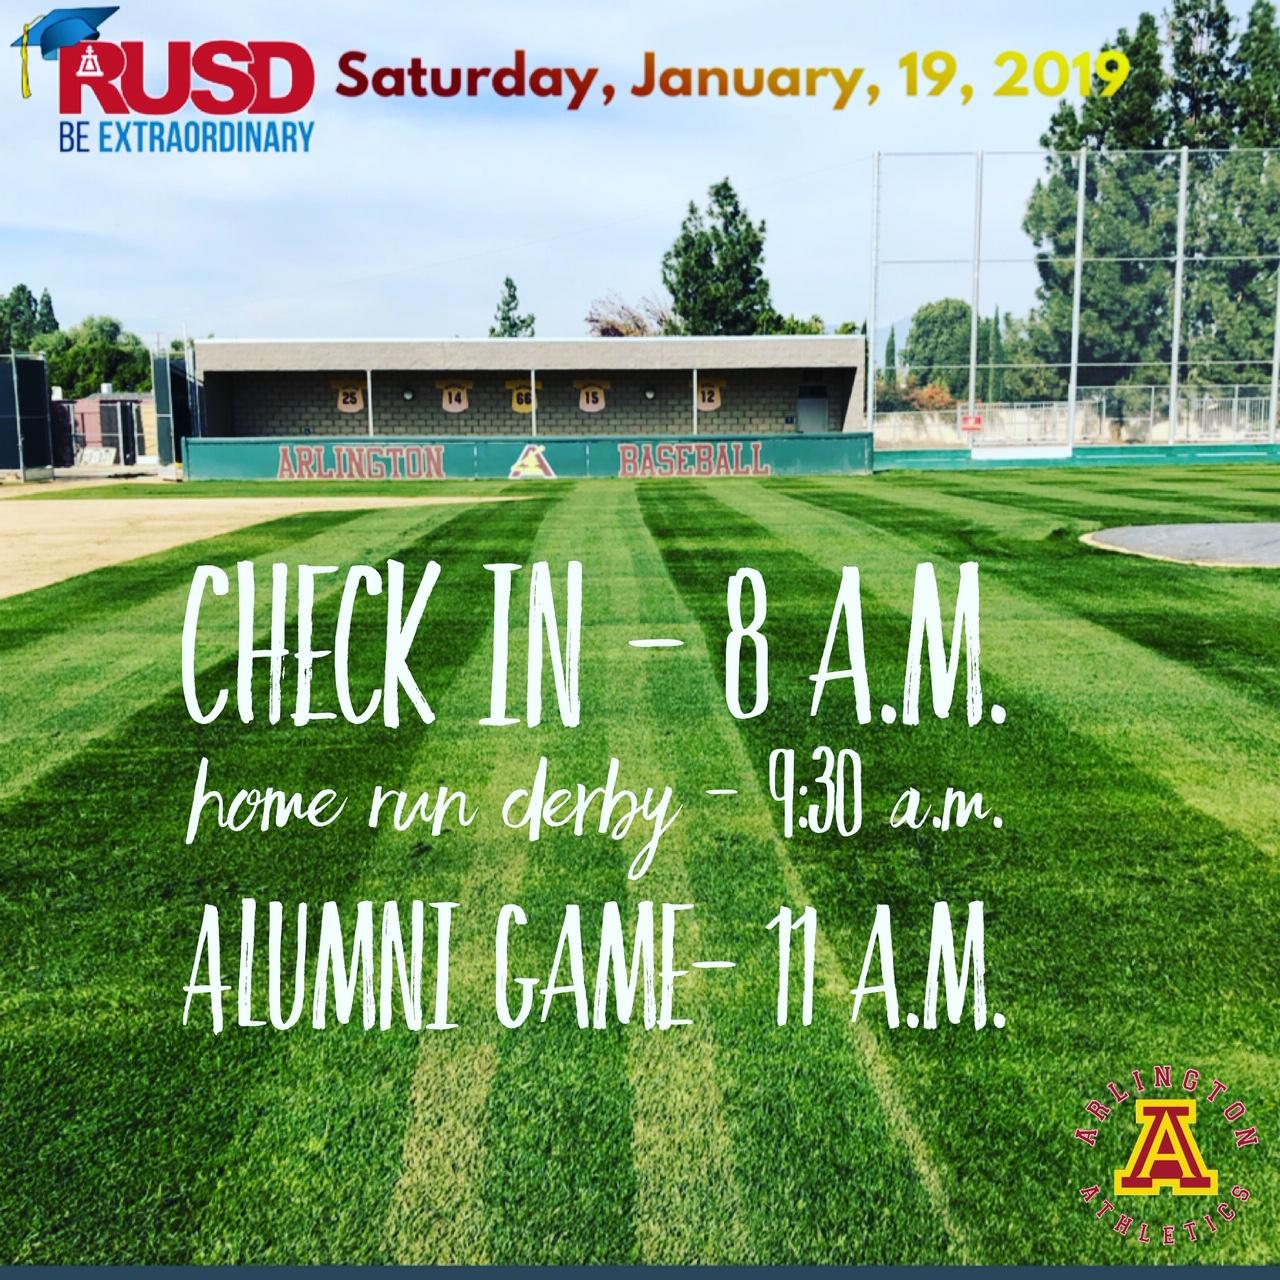 Saturday, 1/19/2019: Arlington Baseball Alumni Game